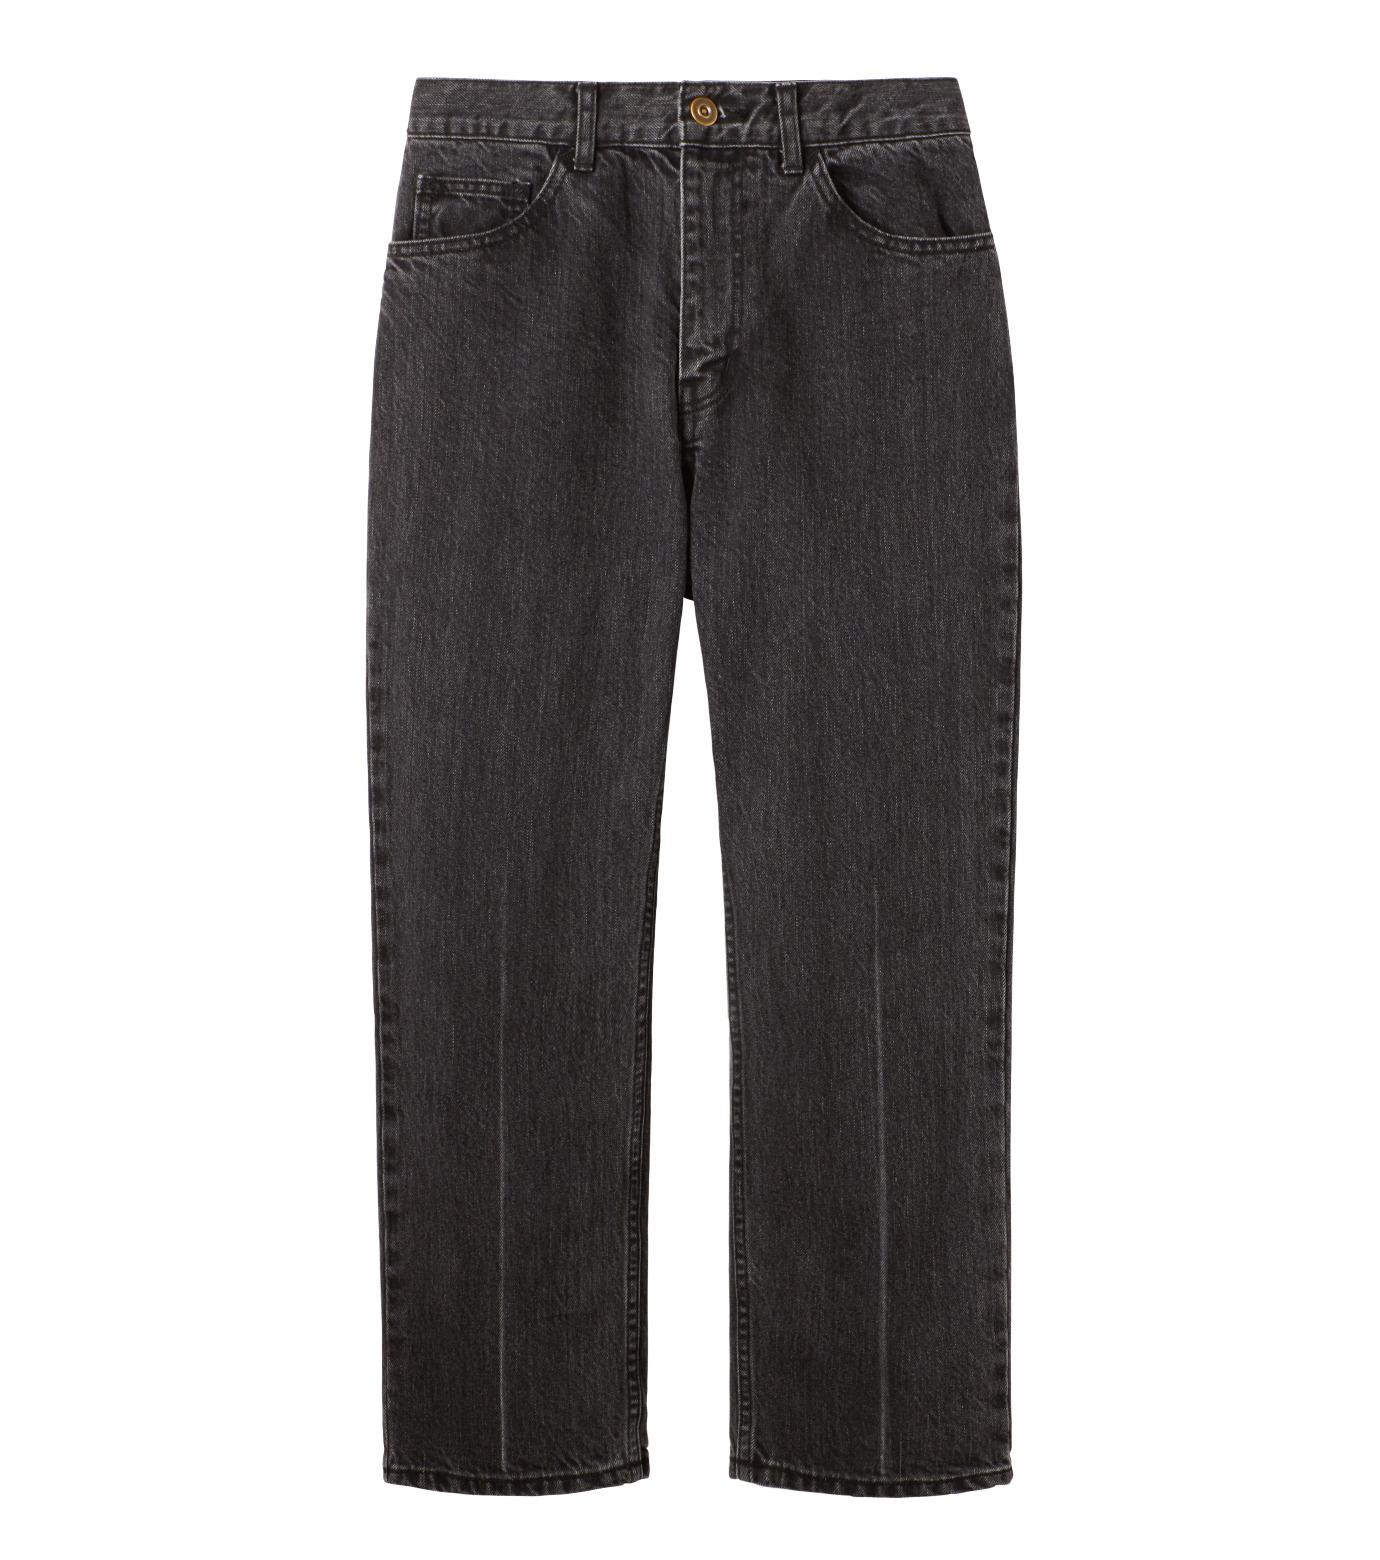 LE CIEL BLEU(ルシェルブルー)のセンタープレスデニムパンツ-BLACK(パンツ/pants)-18A68515 拡大詳細画像4